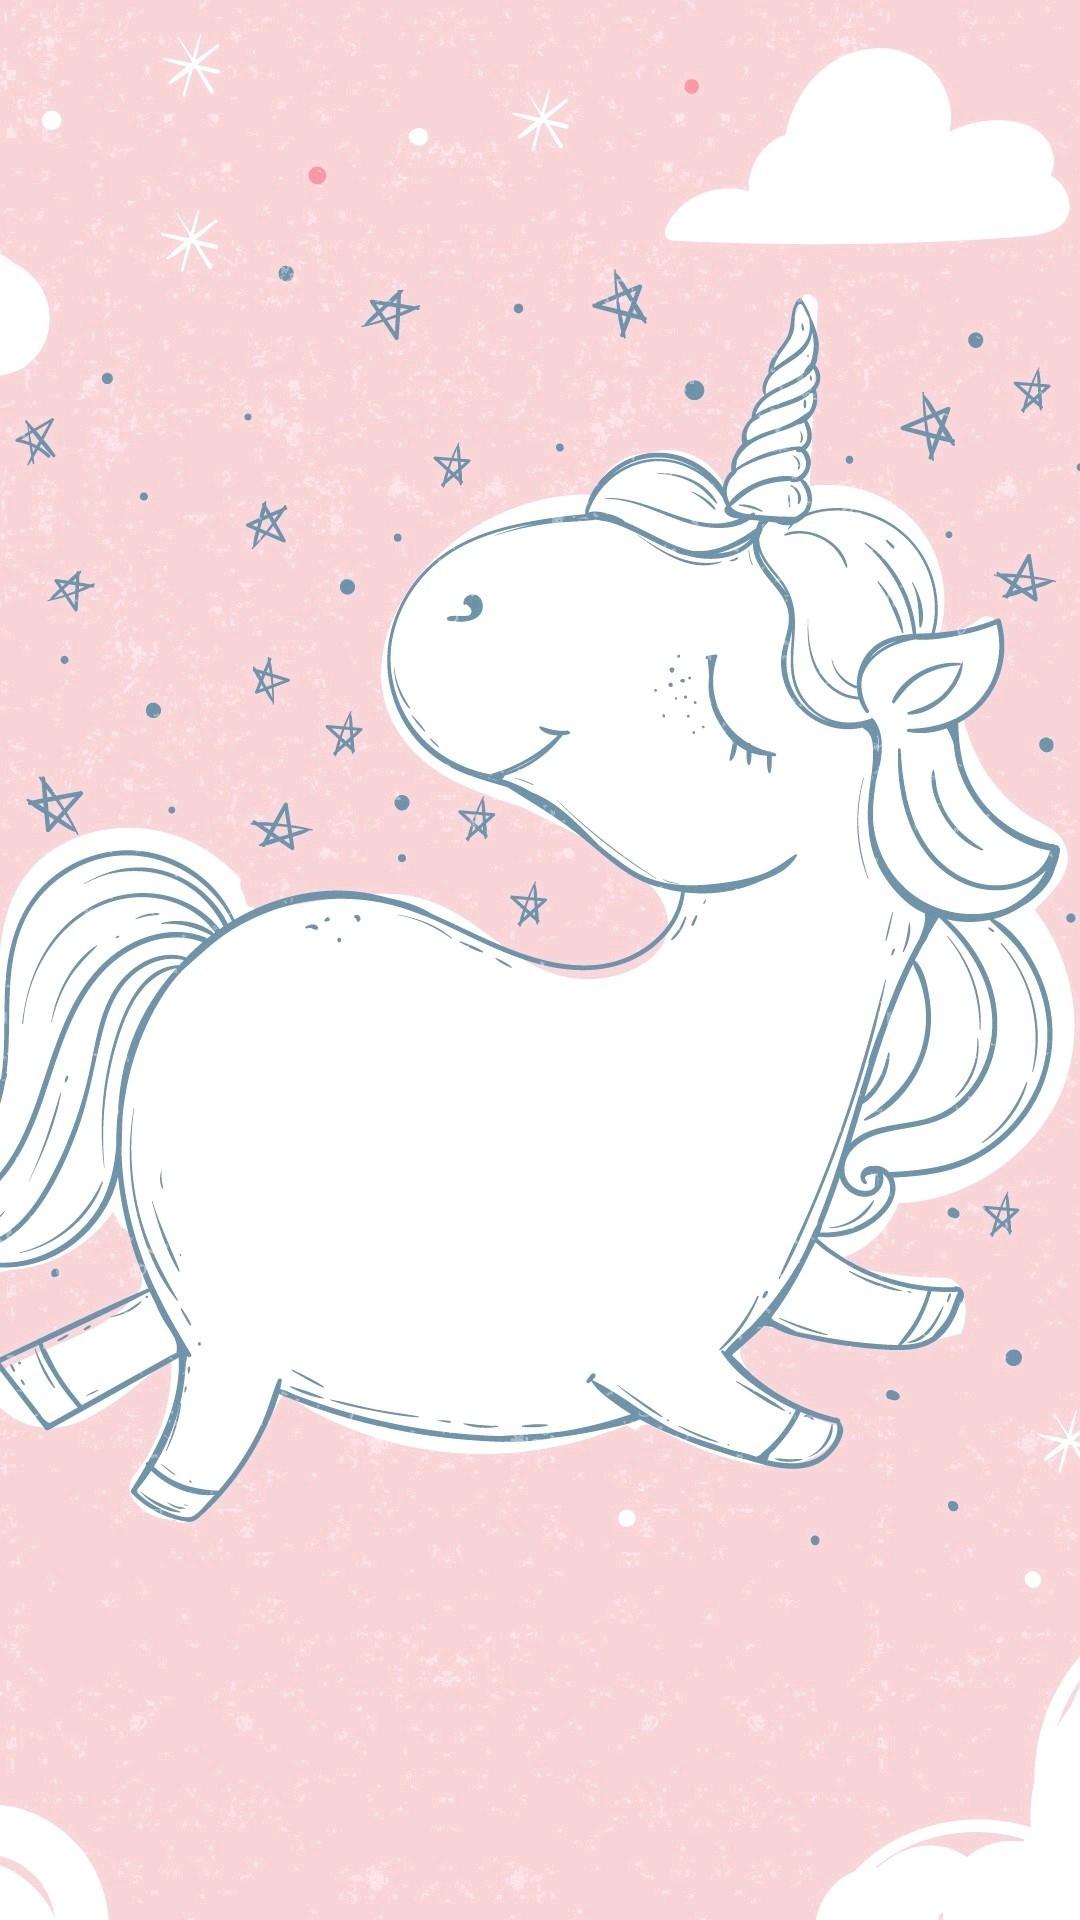 Res: 1080x1920, Best Cartoon Unicorn Wallpaper HD - 761645-pink-fluffy-unicorns-wallpapers-